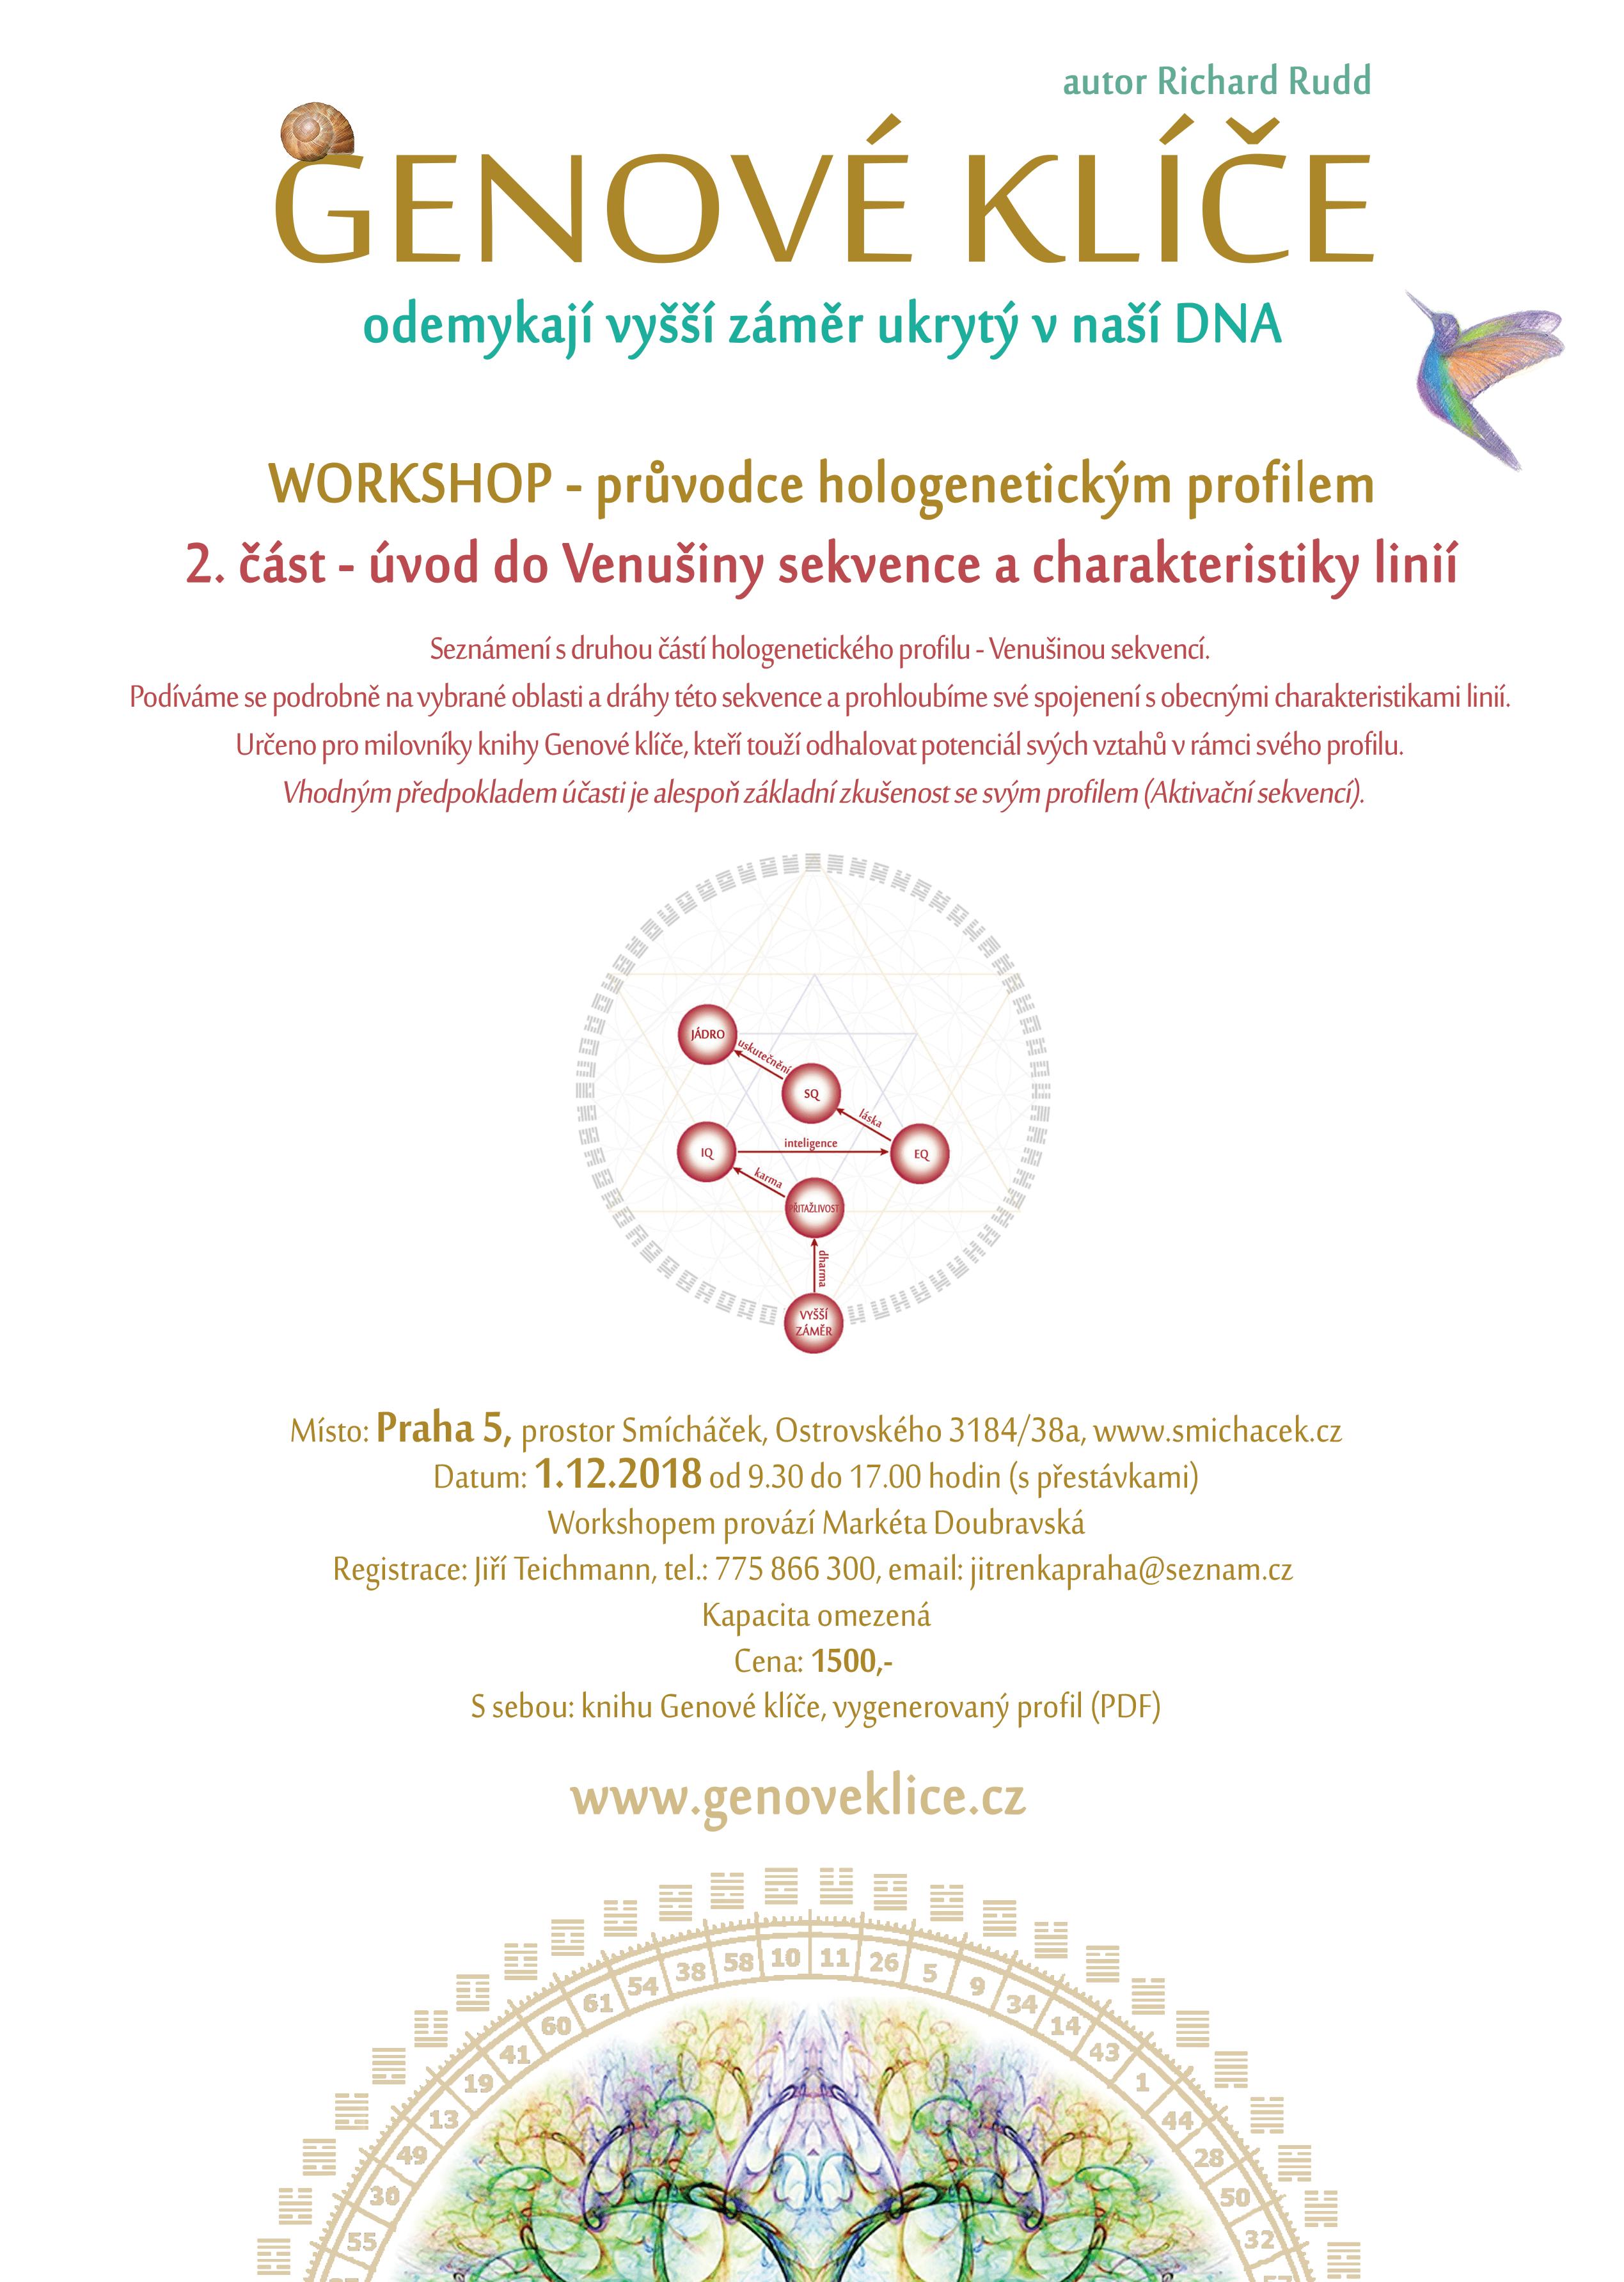 1.12.2018 workshop v Praze – úvod do Venušiny sekvence